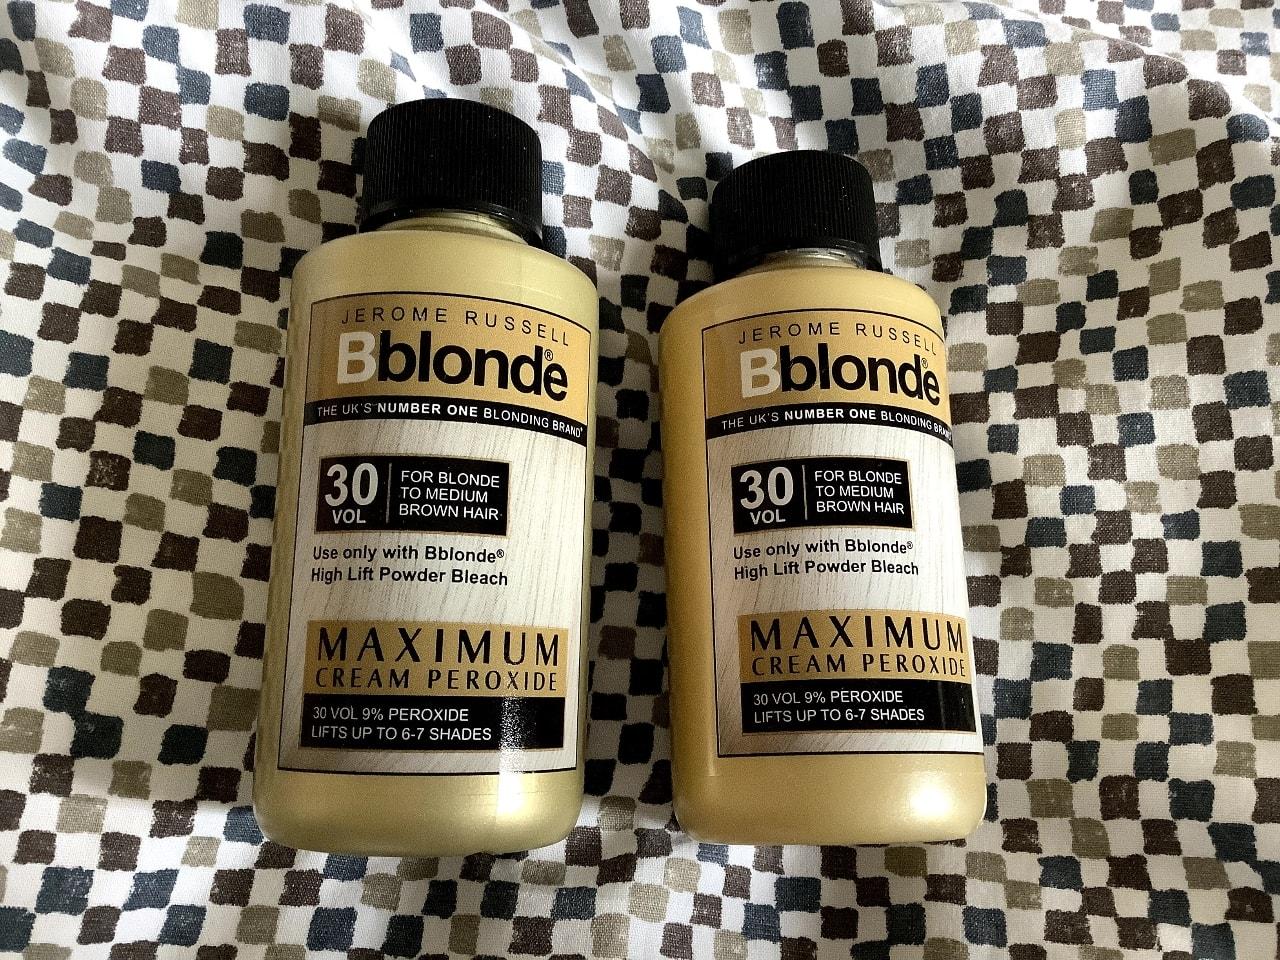 Jerome Russell Bblonde 30 vol peroxide cream